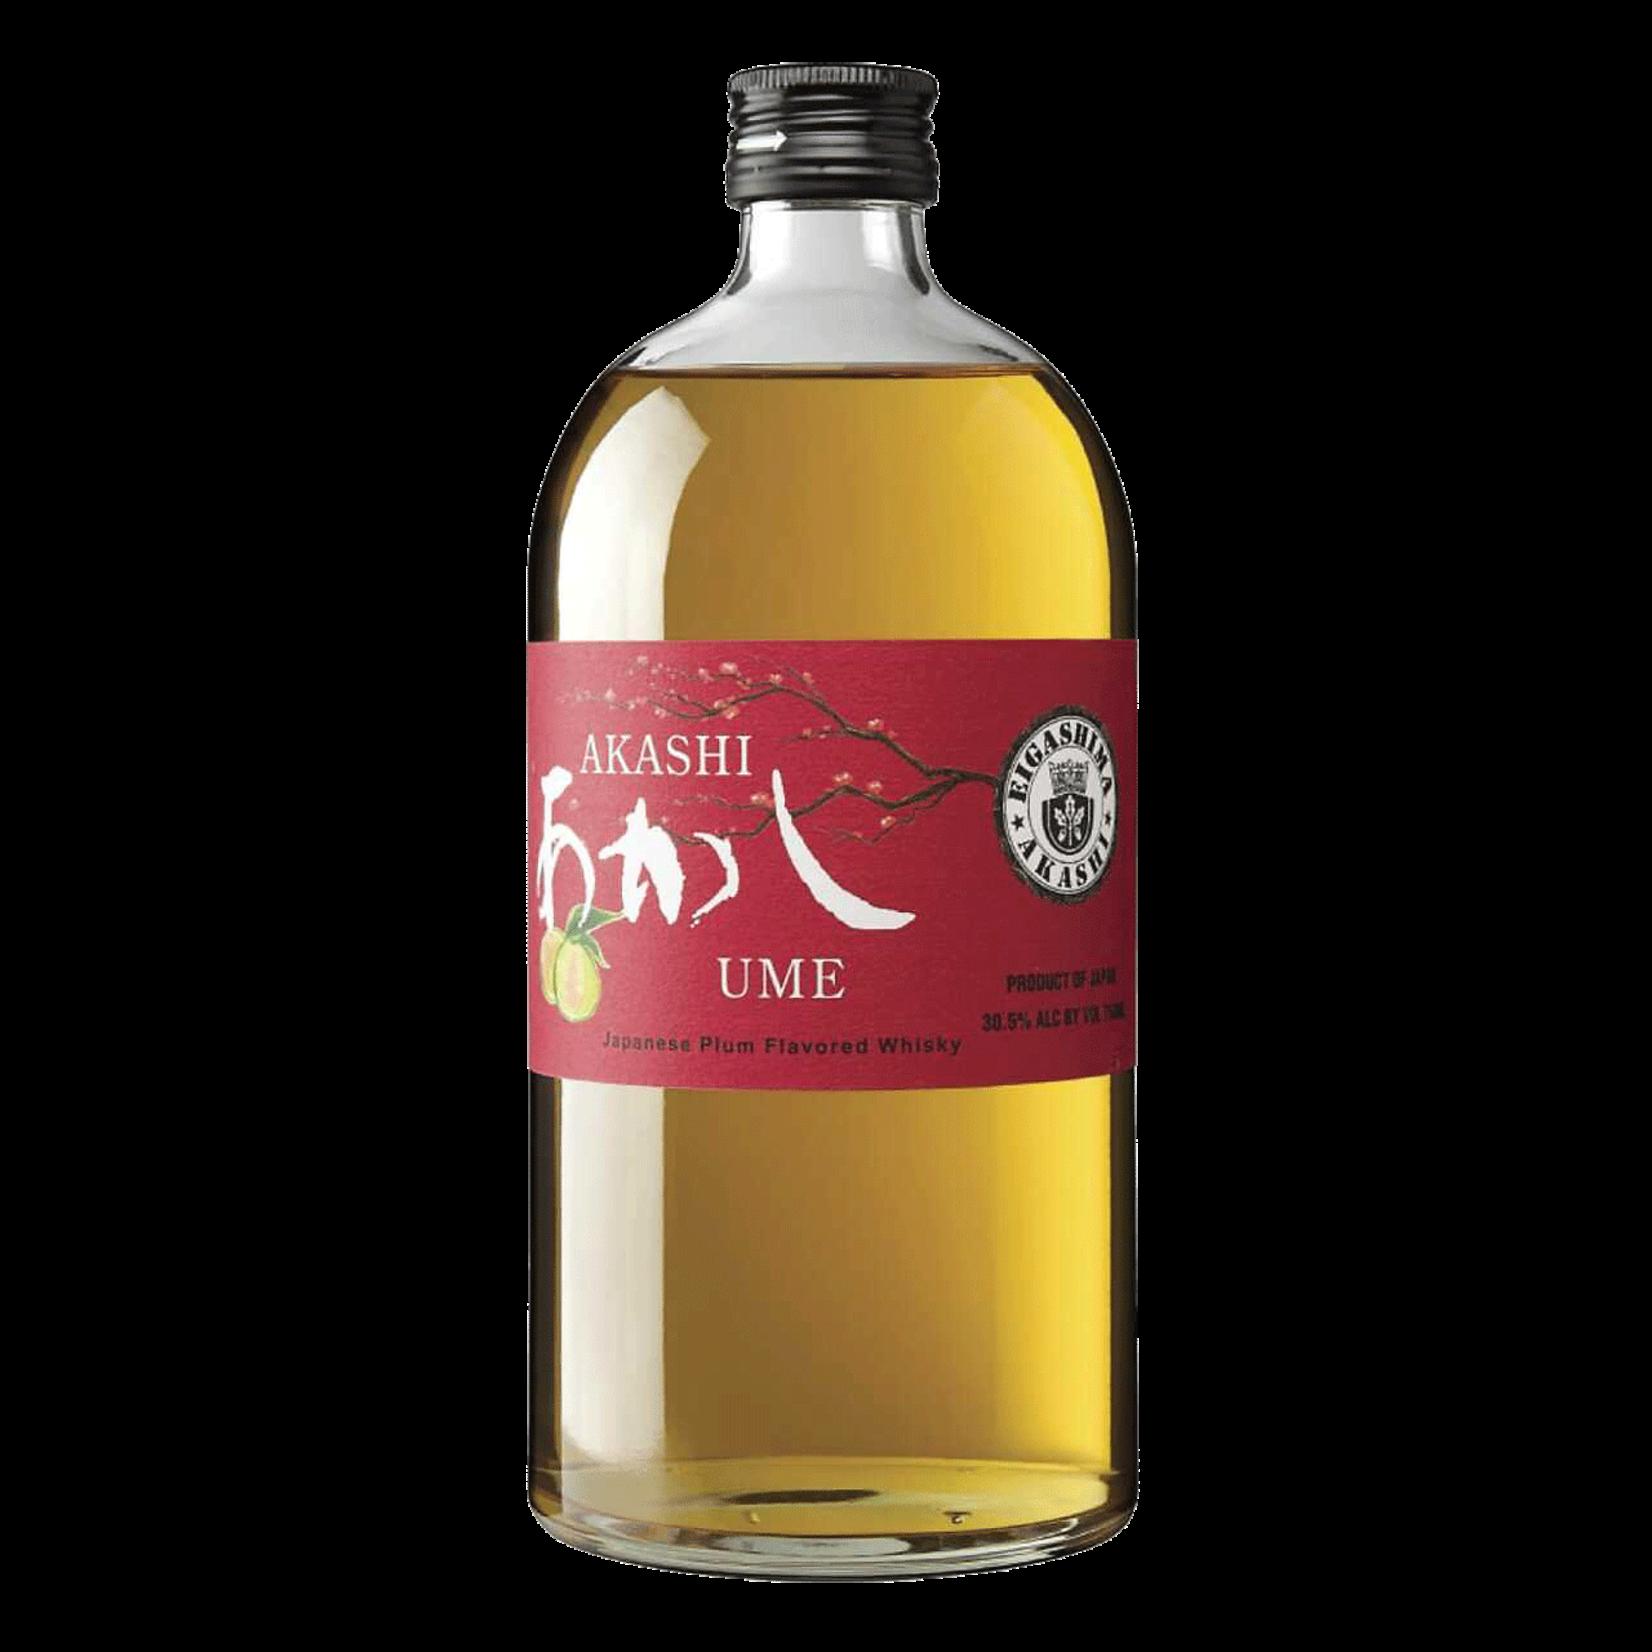 Spirits Akashi Ume Japanese Plum Flavored Whisky